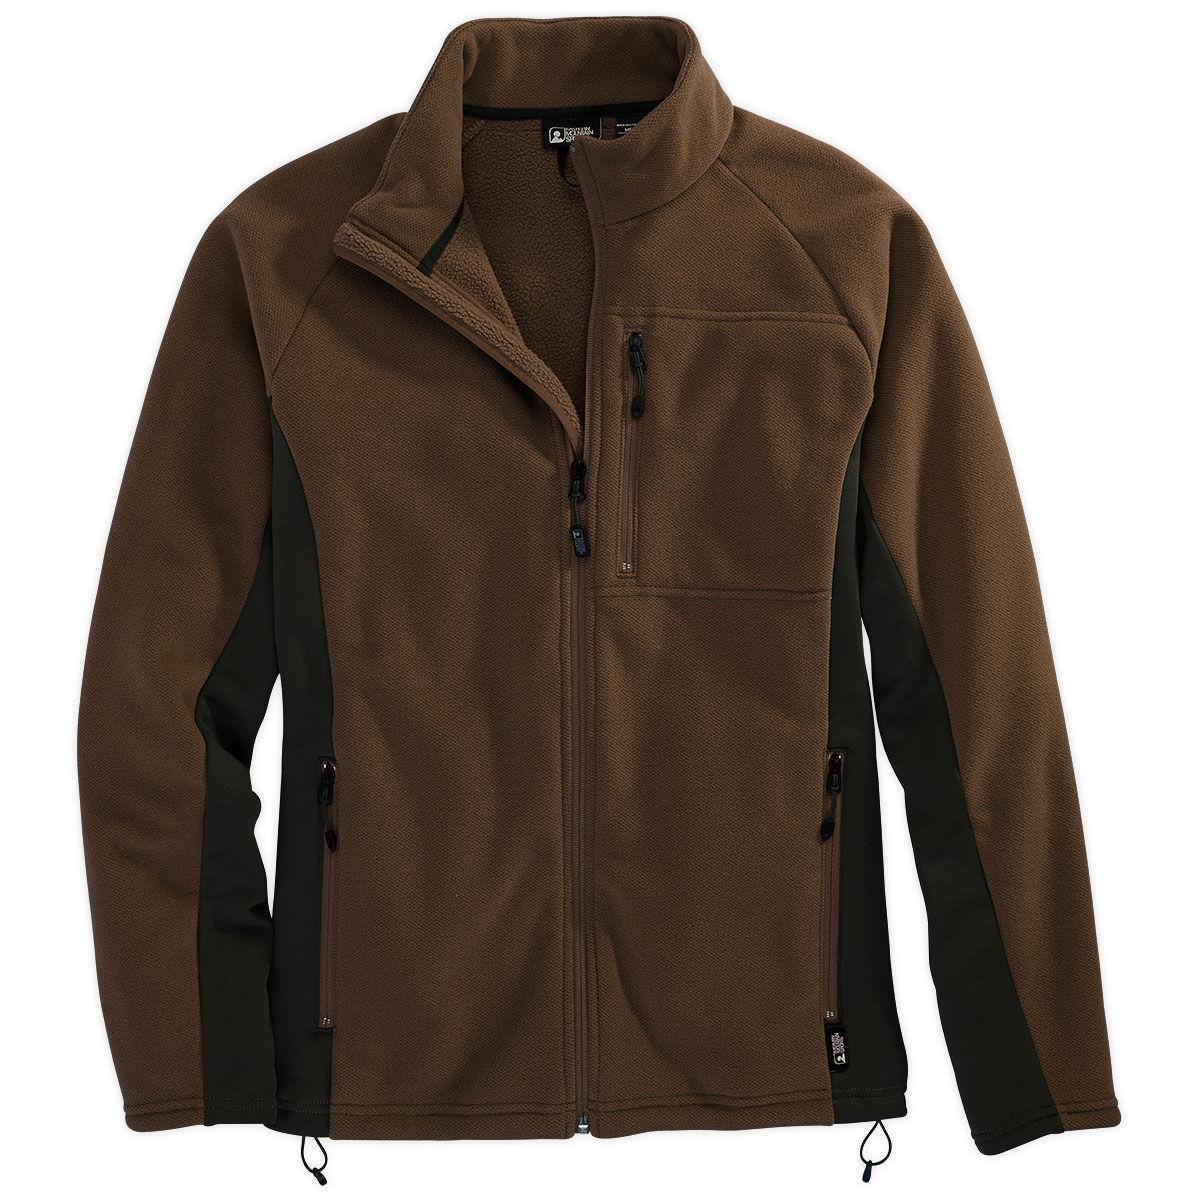 EMS Tuner Jacket